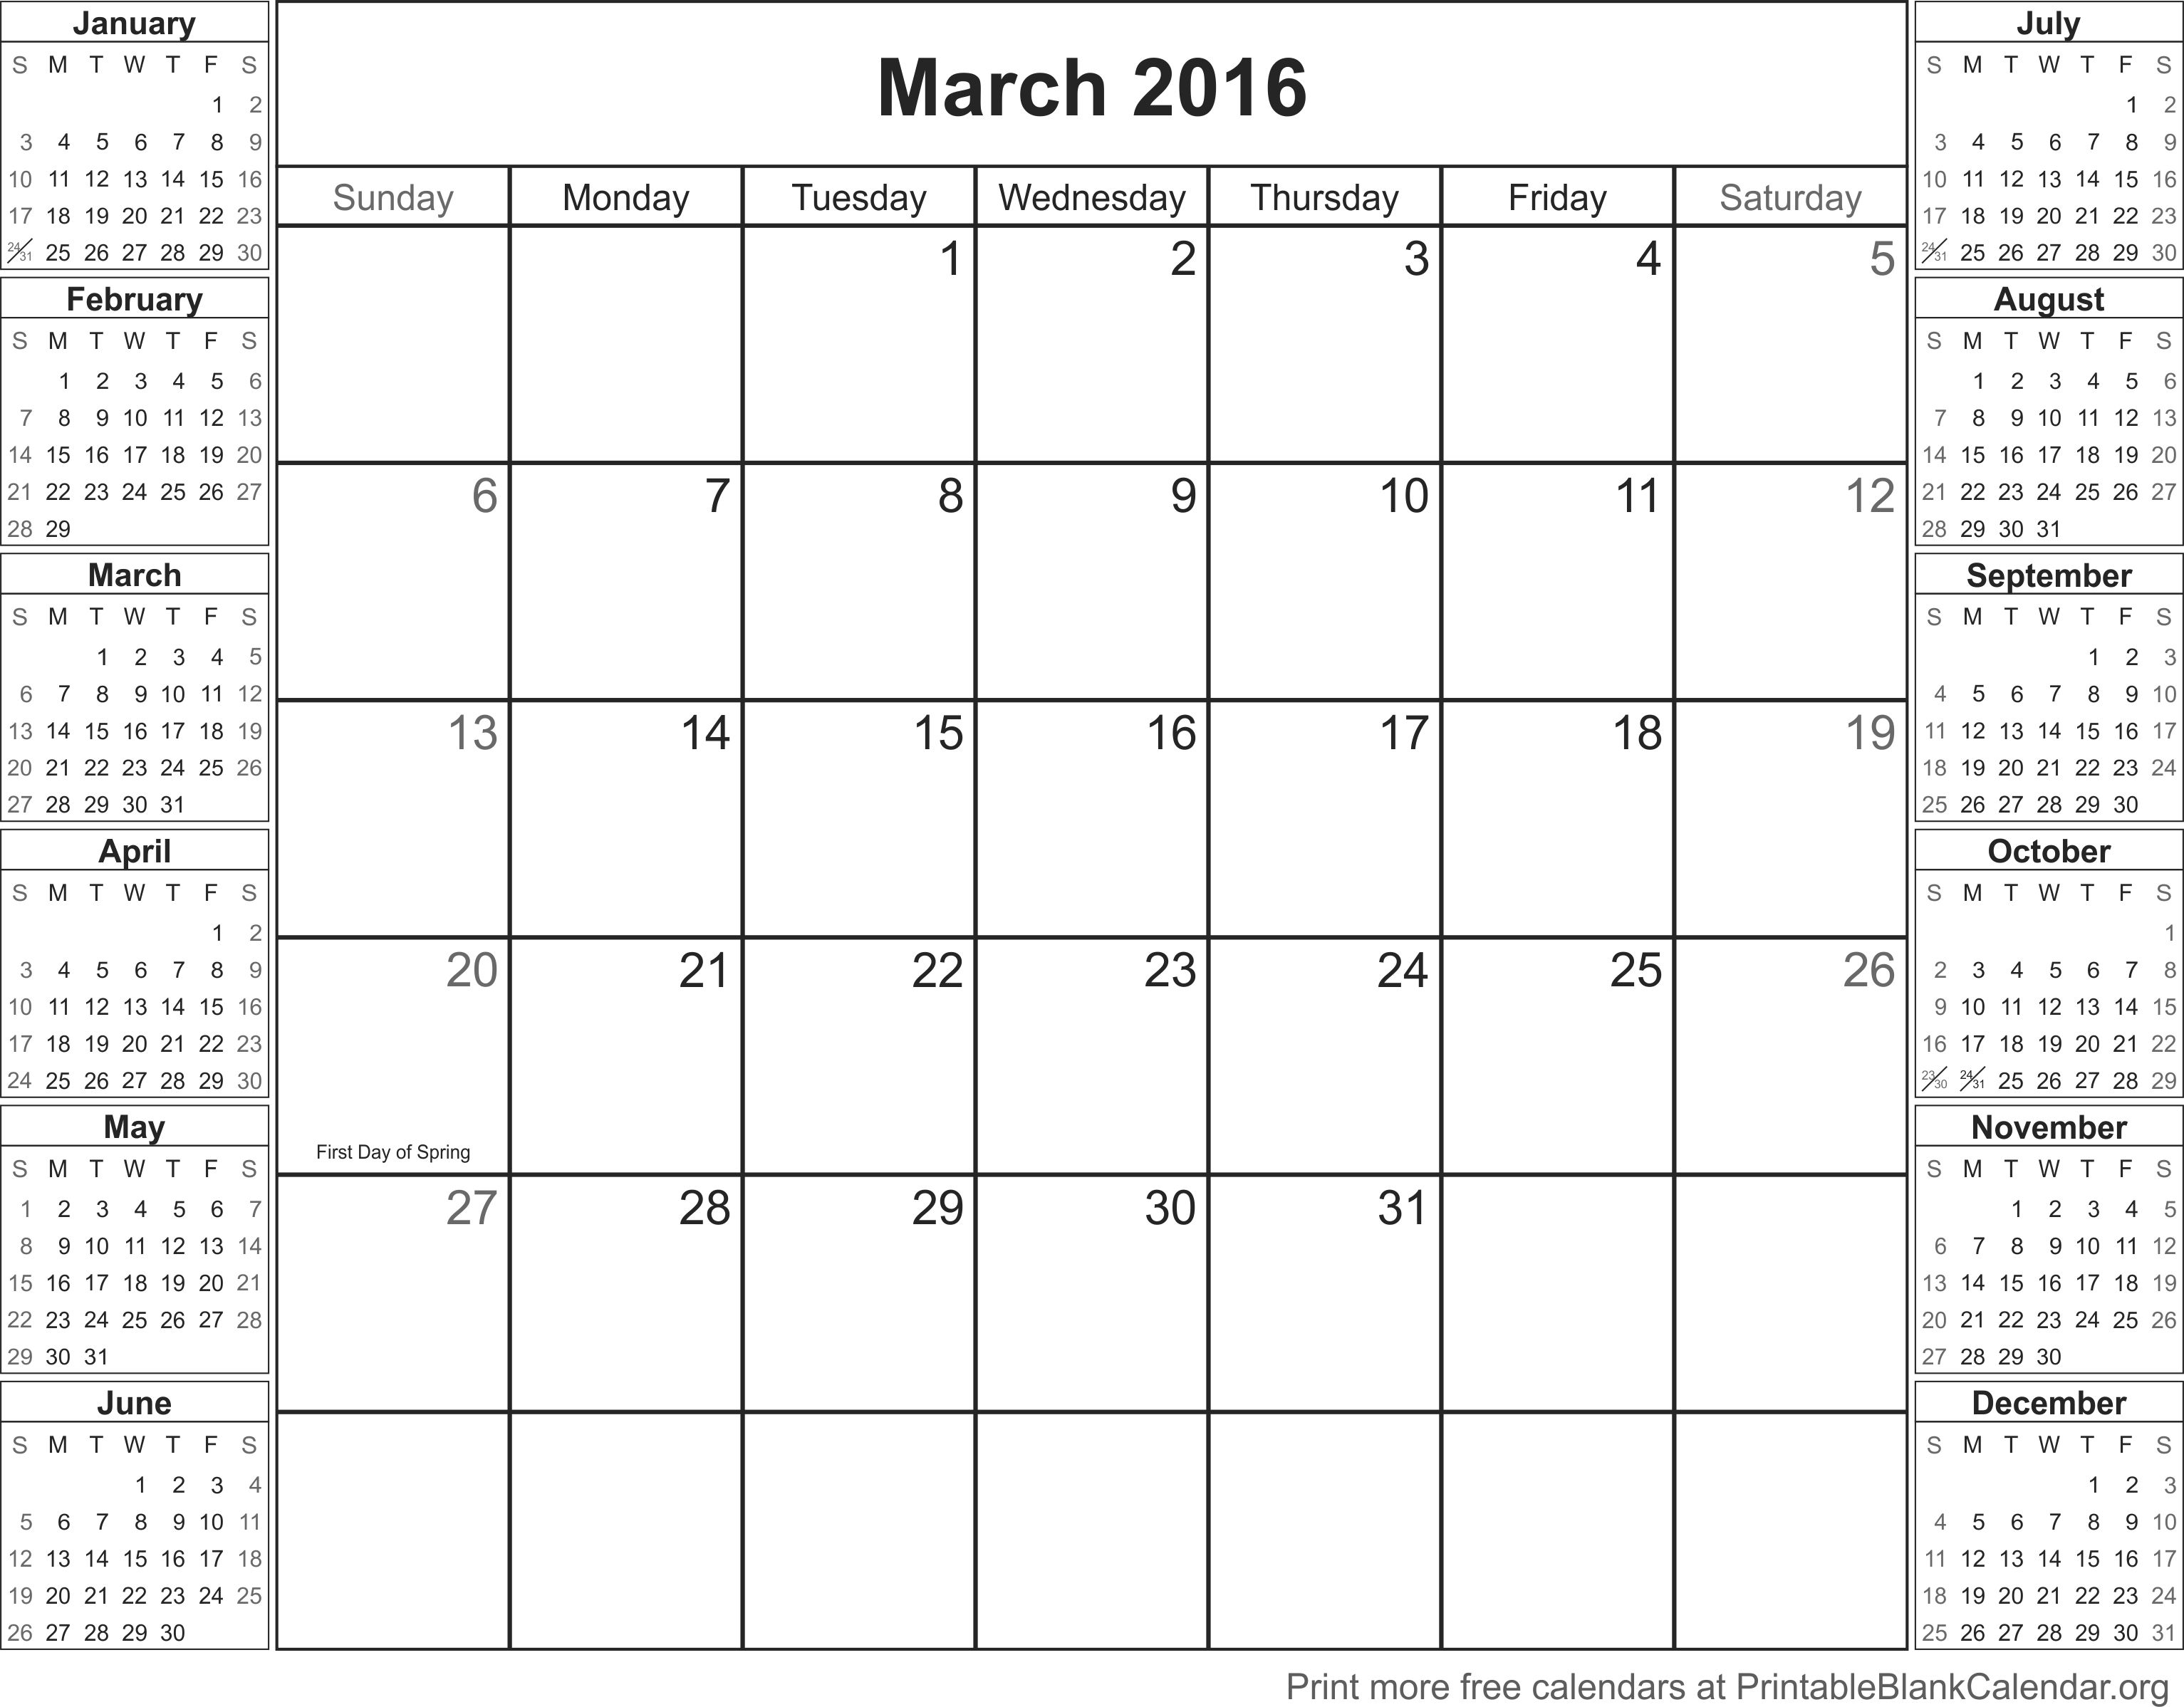 calendario-para-imprimir-mar-2016